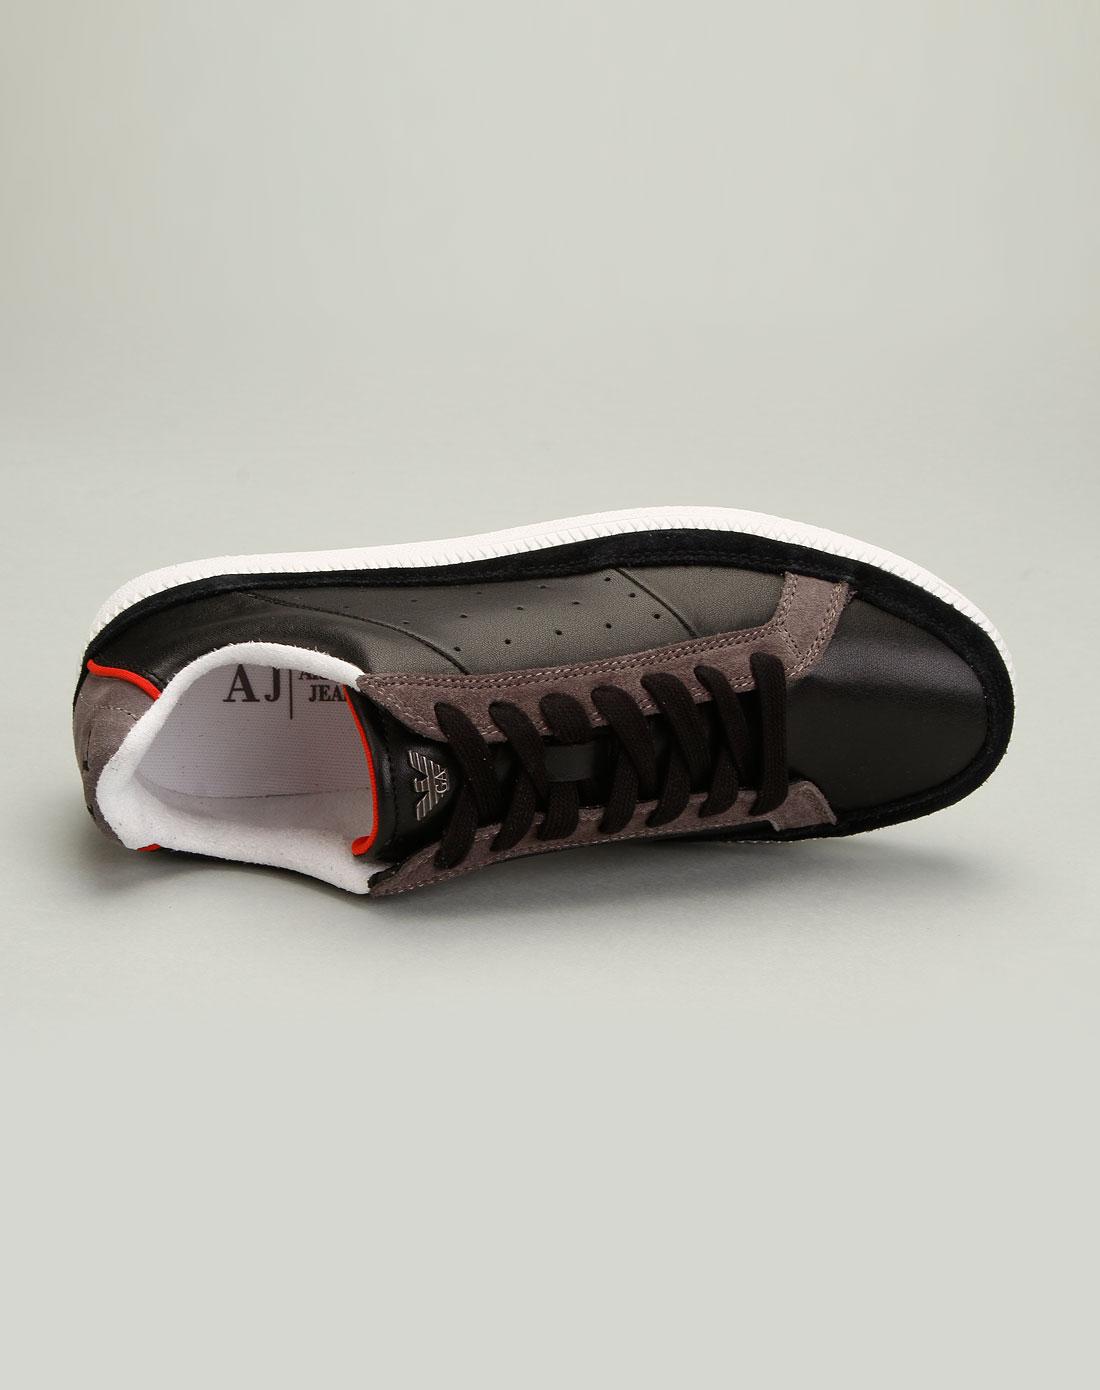 armani鞋子专场aj男款简约风尚透气真皮休闲鞋黑色